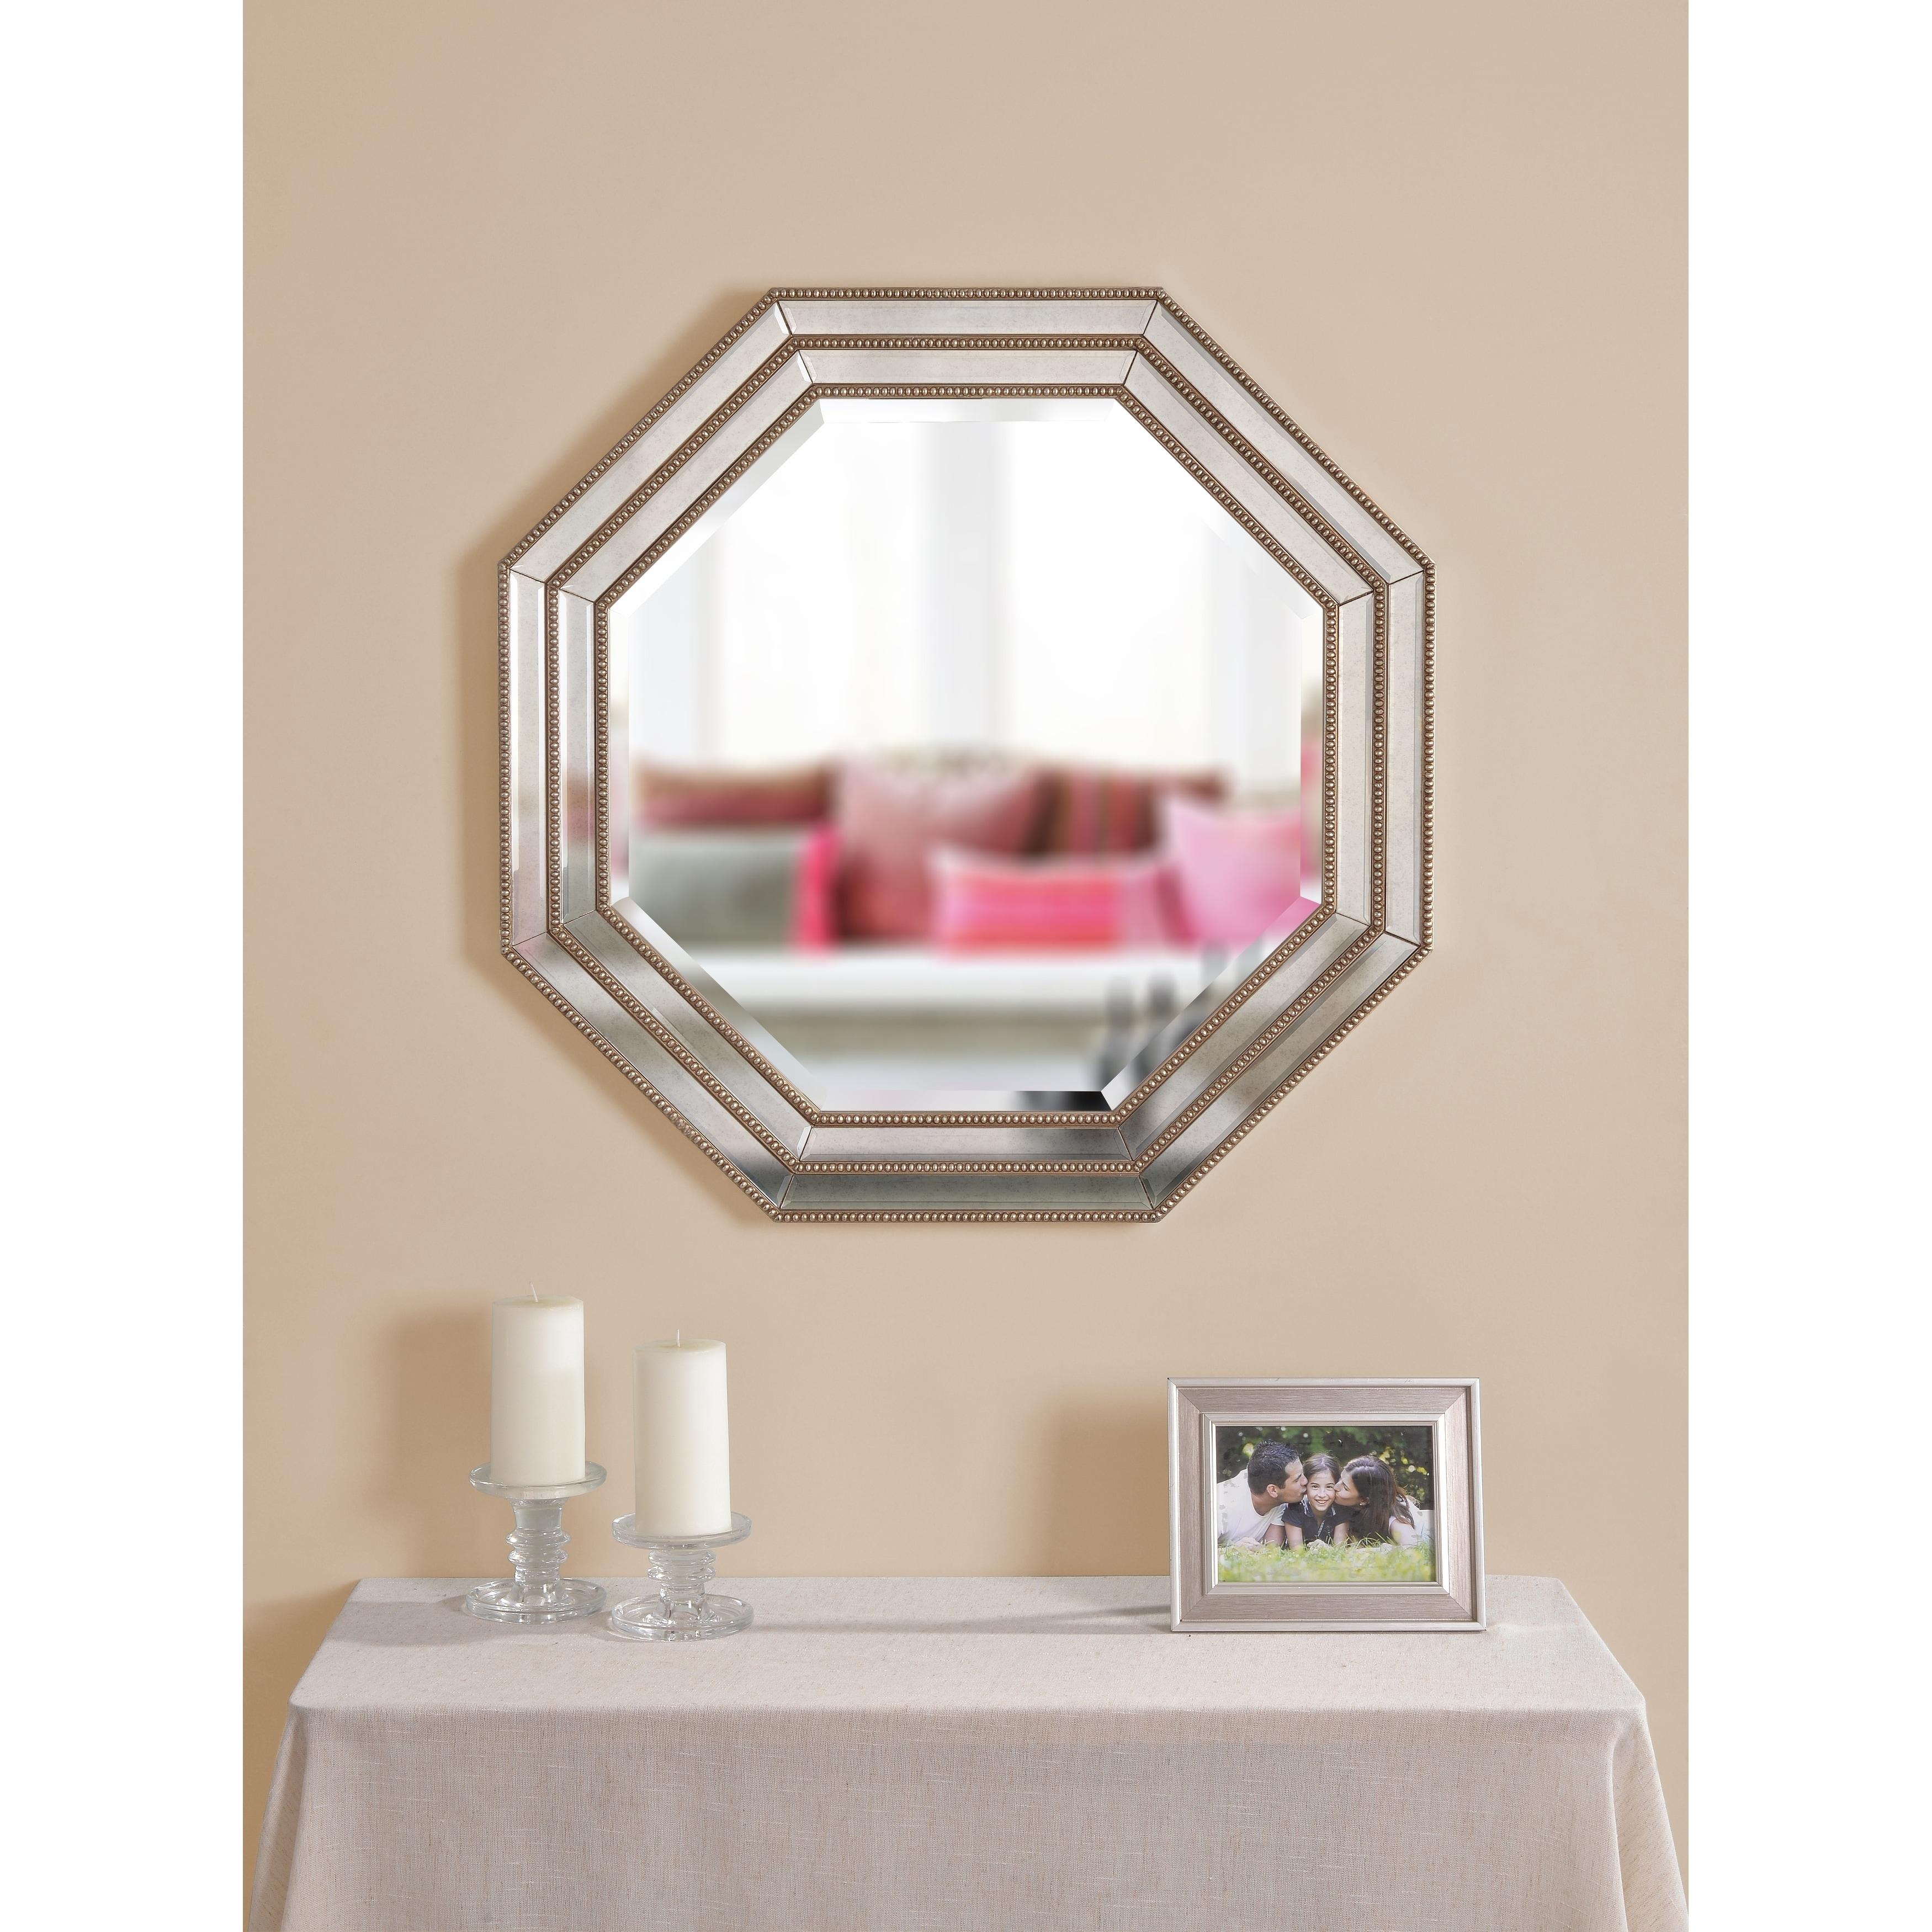 Finn 30 octagon champagne wall mirror by design craft